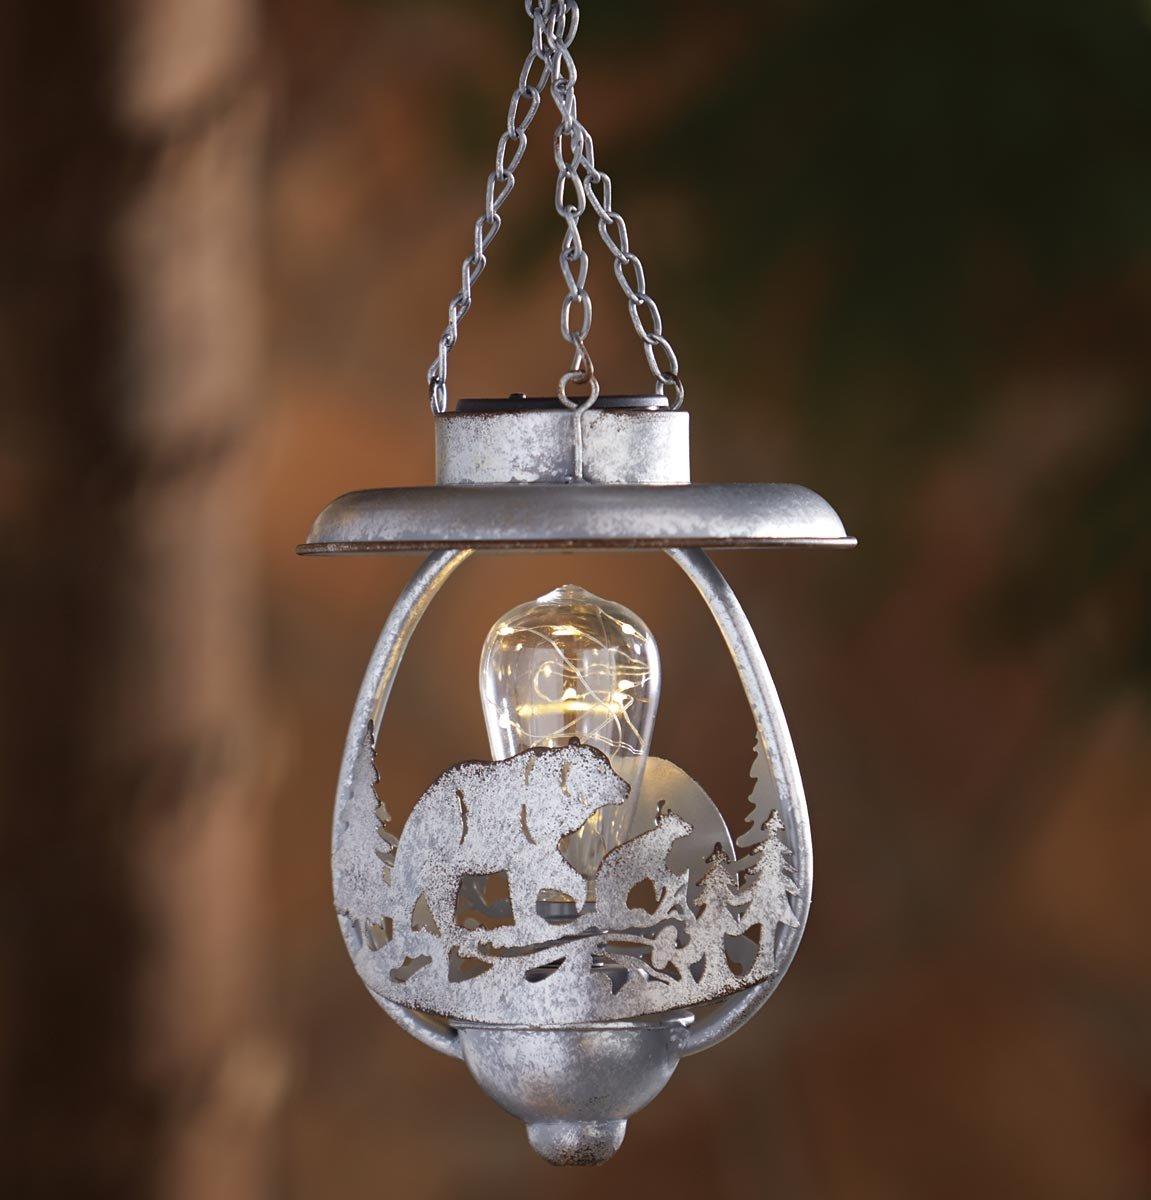 Black Forest Decor Walking Bear Hanging LED Solar Lantern - CLEARANCE